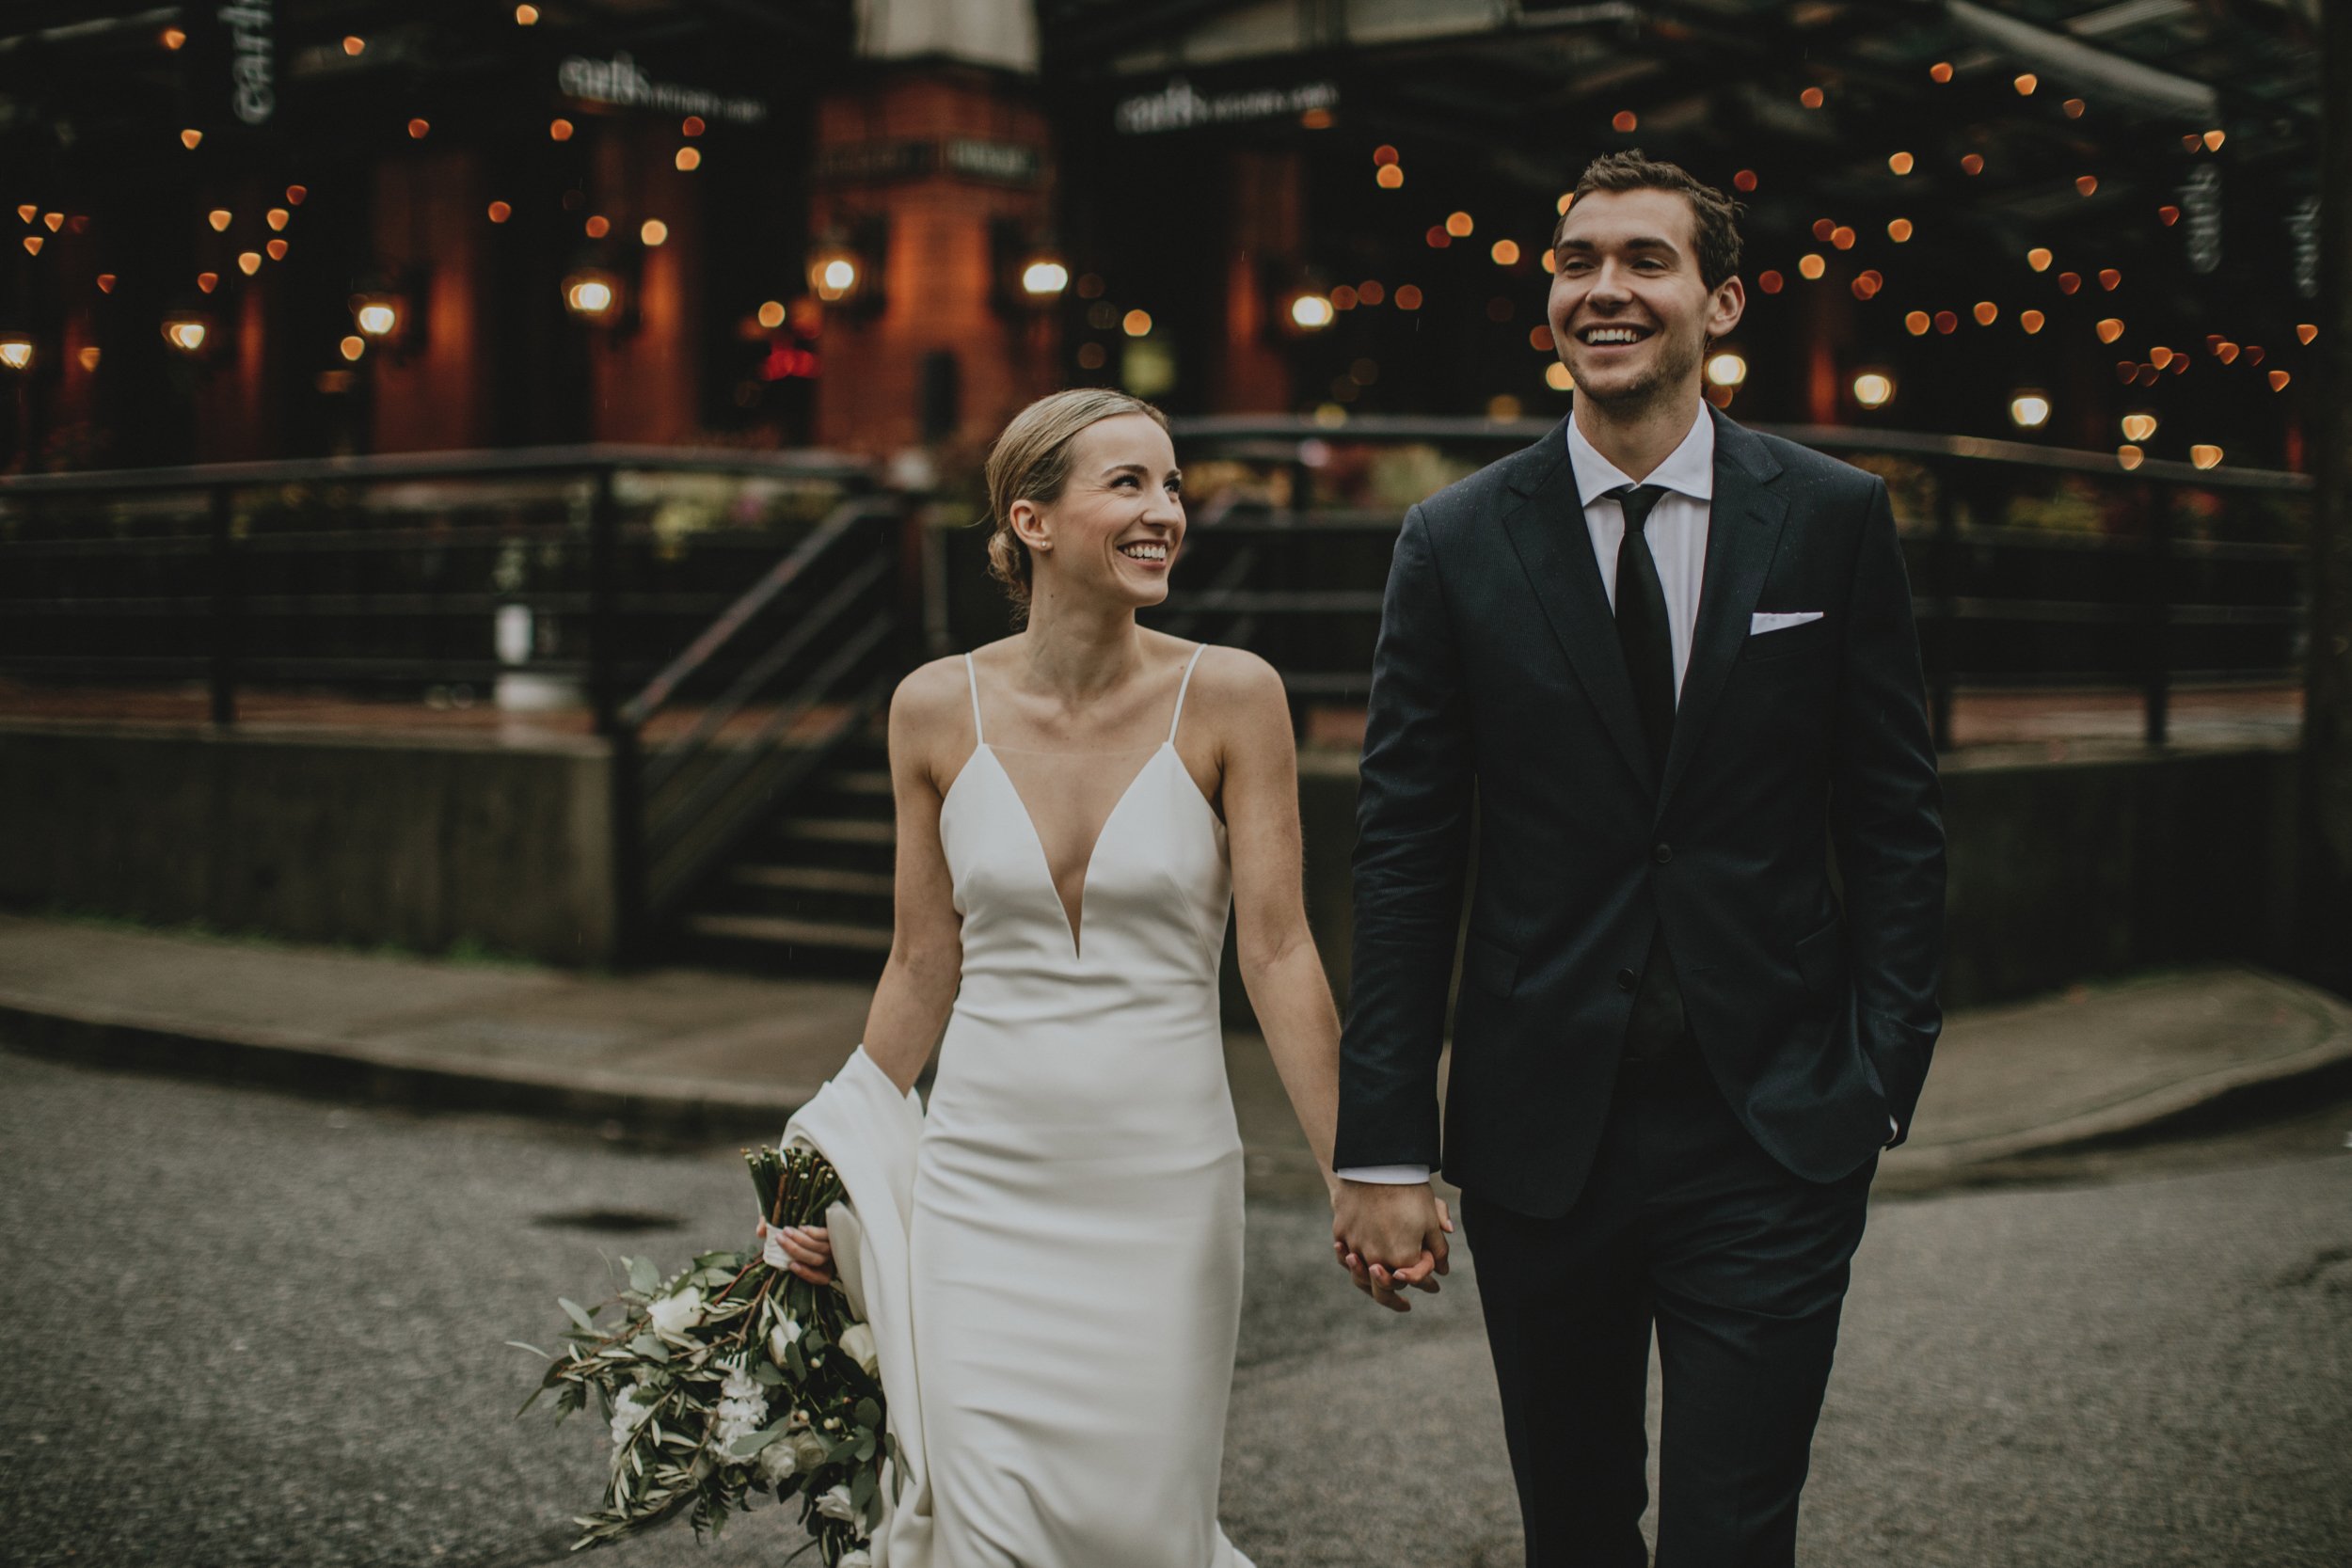 Earls-Loft-City-Vancouver-Wedding-18.jpg